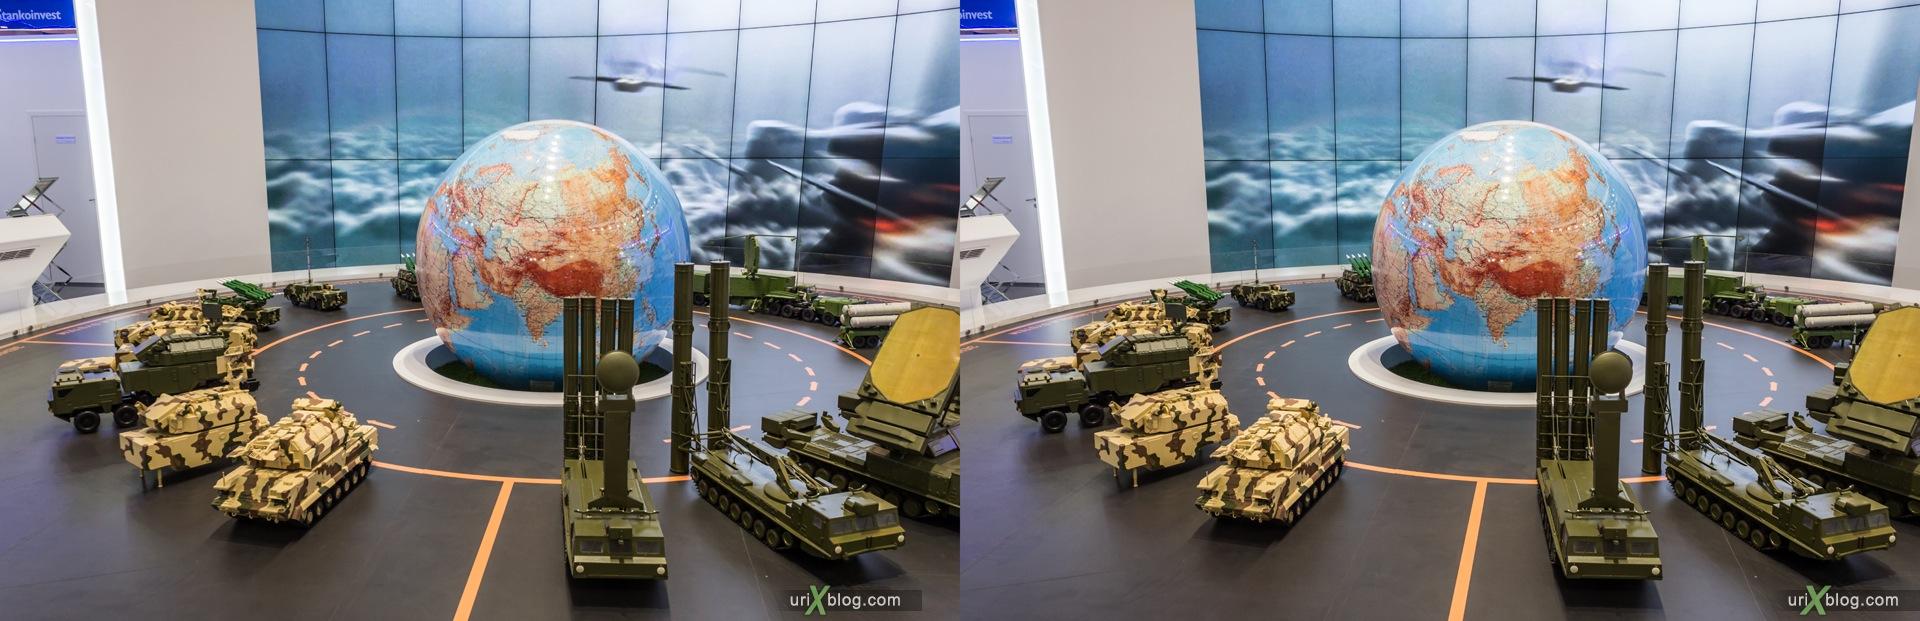 2013, MAKS, International Aviation and Space Salon, Russia, Ramenskoye airfield, 3D, stereo pair, cross-eyed, crossview, cross view stereo pair, stereoscopic